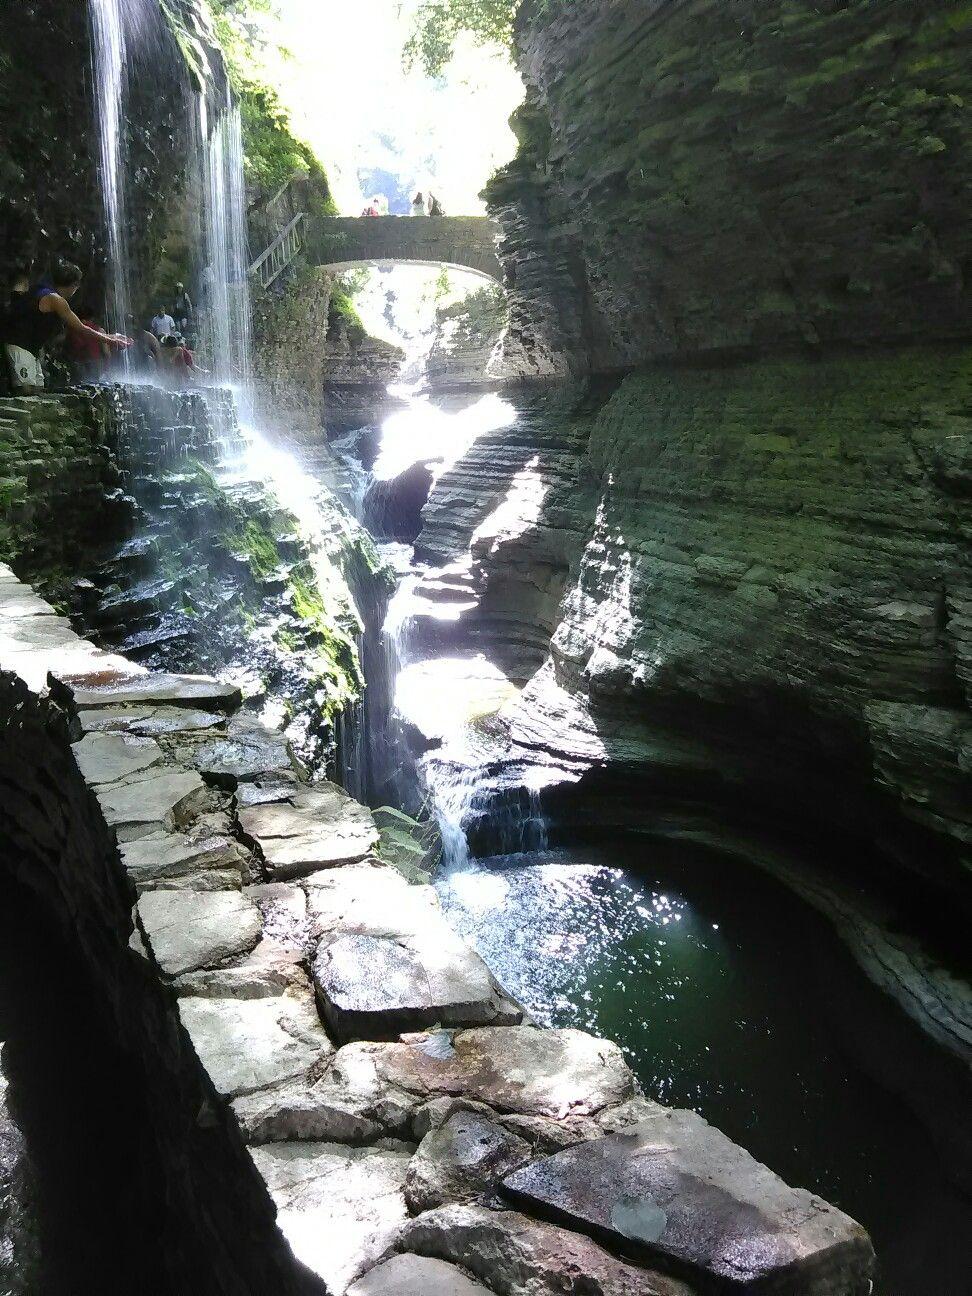 Rainbow waterfall at Watkins Glen State Park, New York 06/18/16